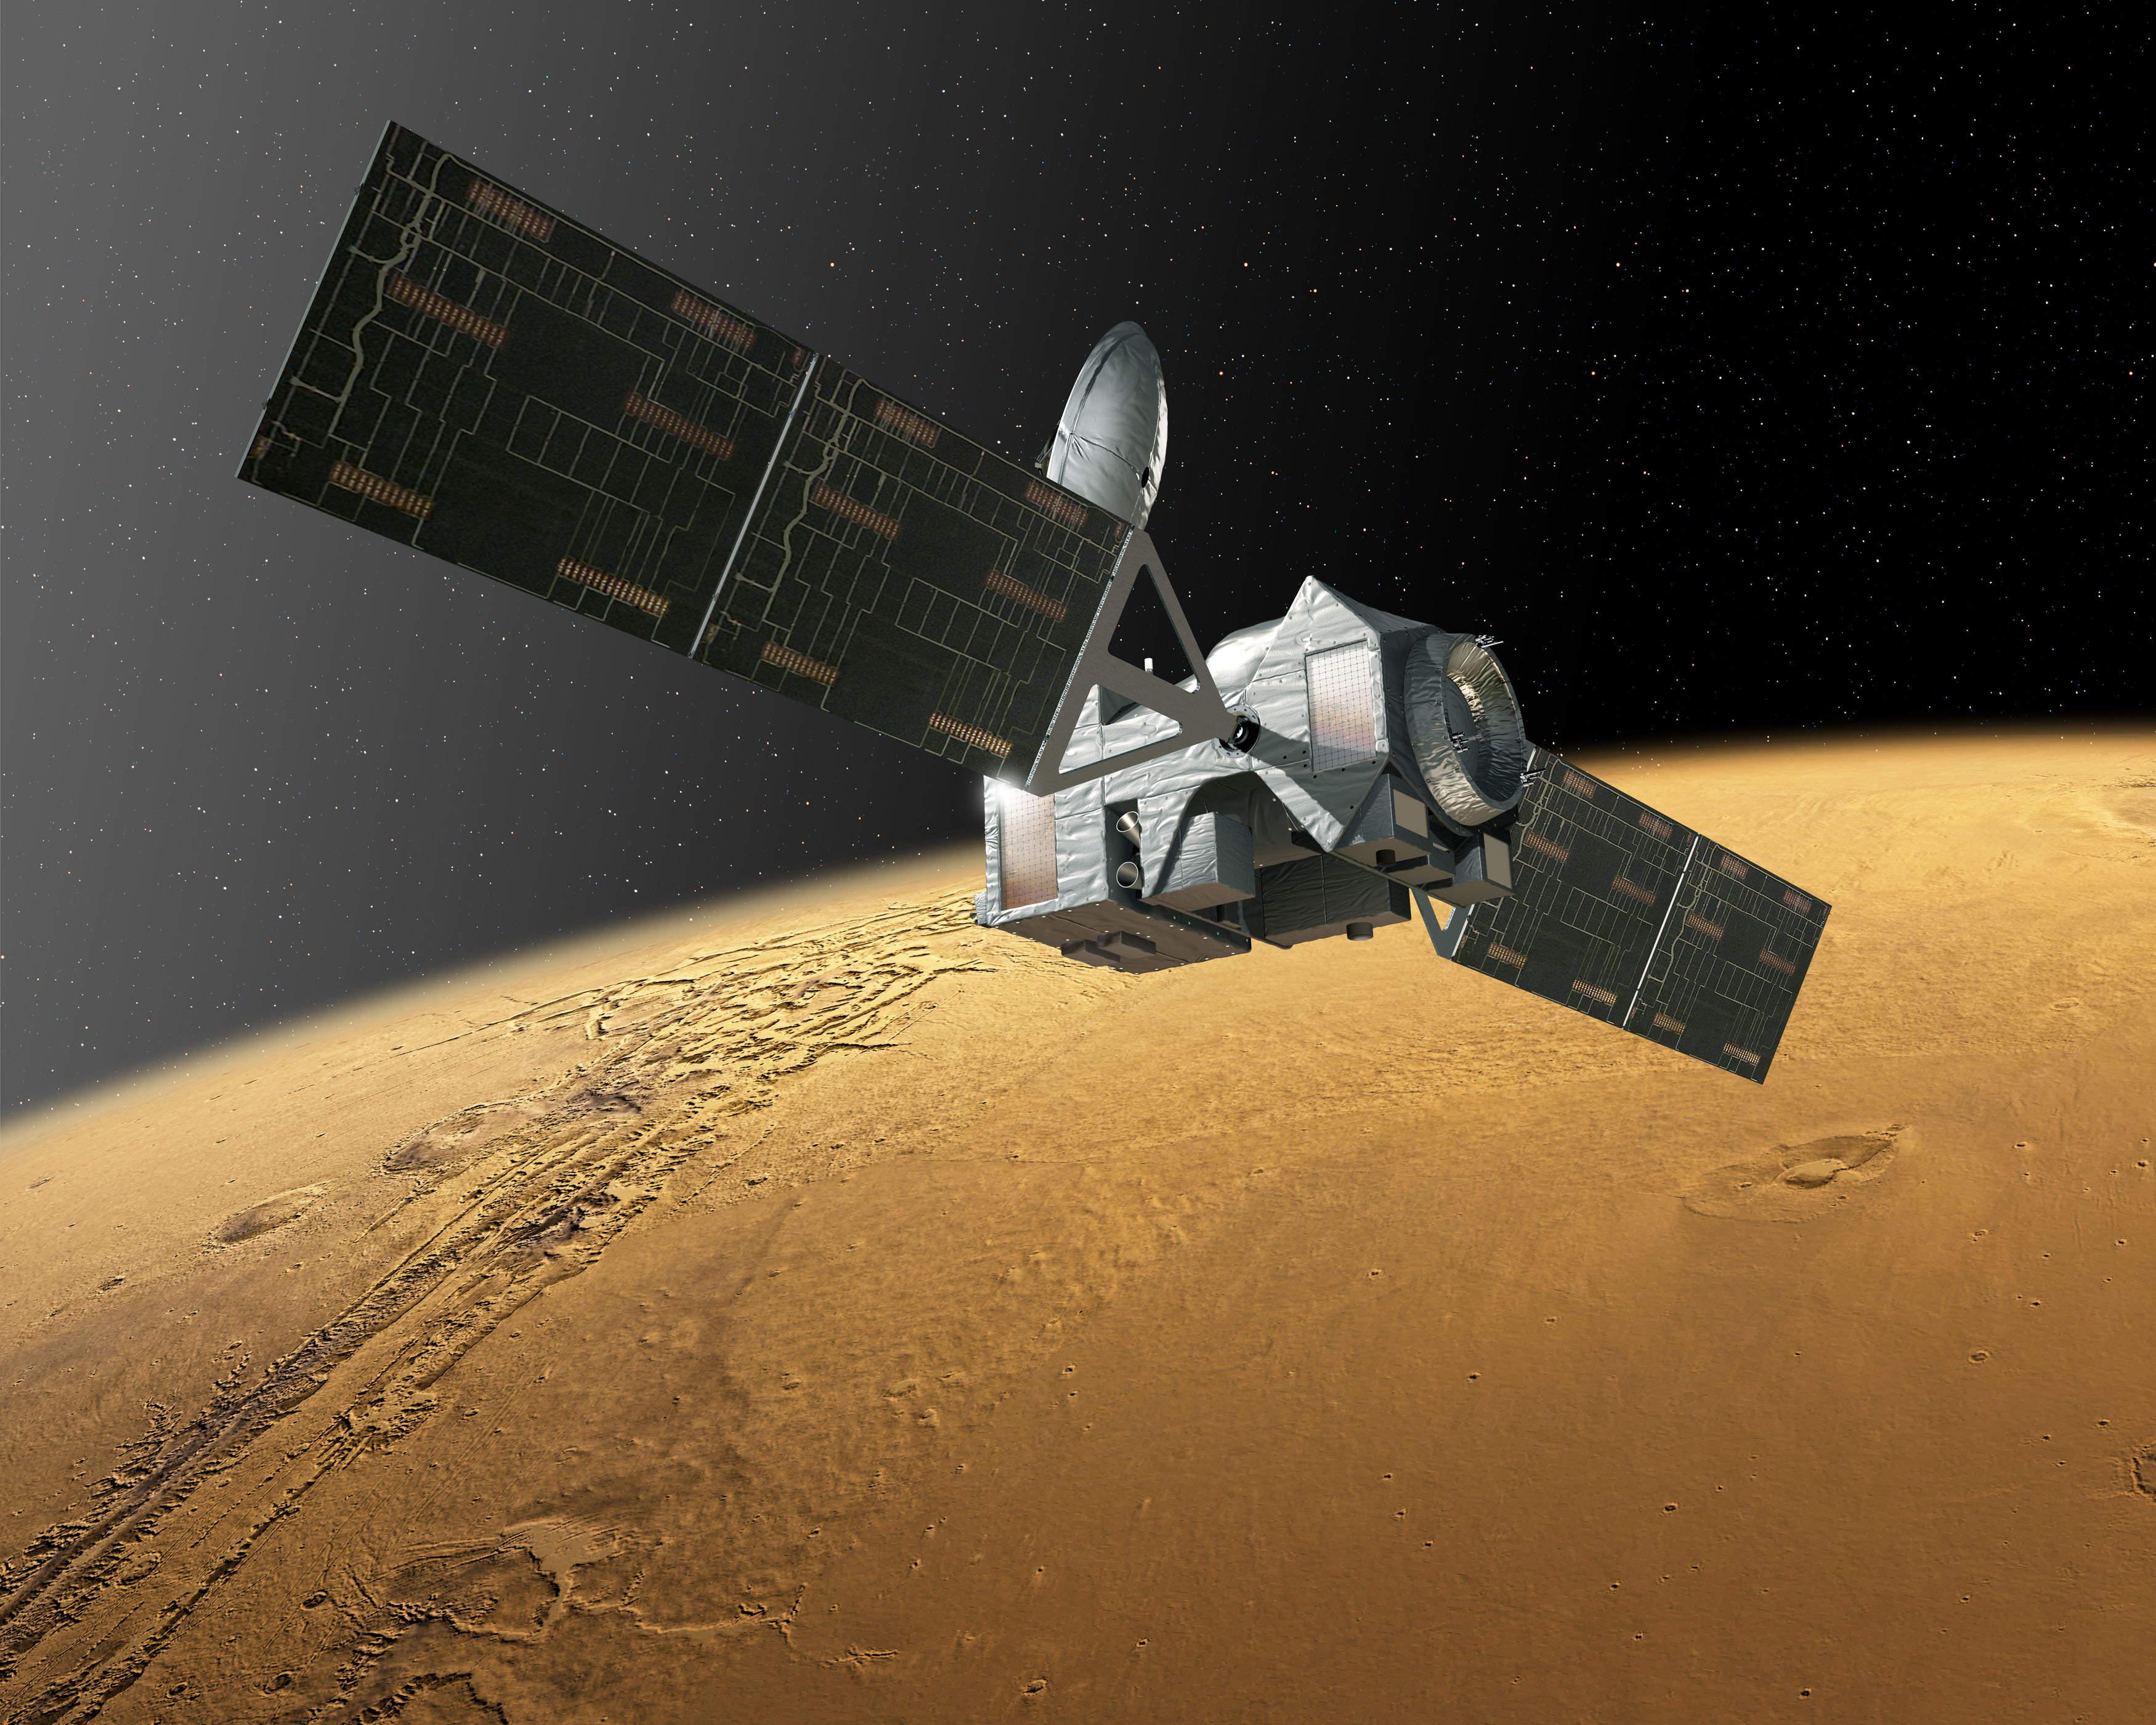 The ExoMars Trace Gas Orbiter (Credit: ESA)